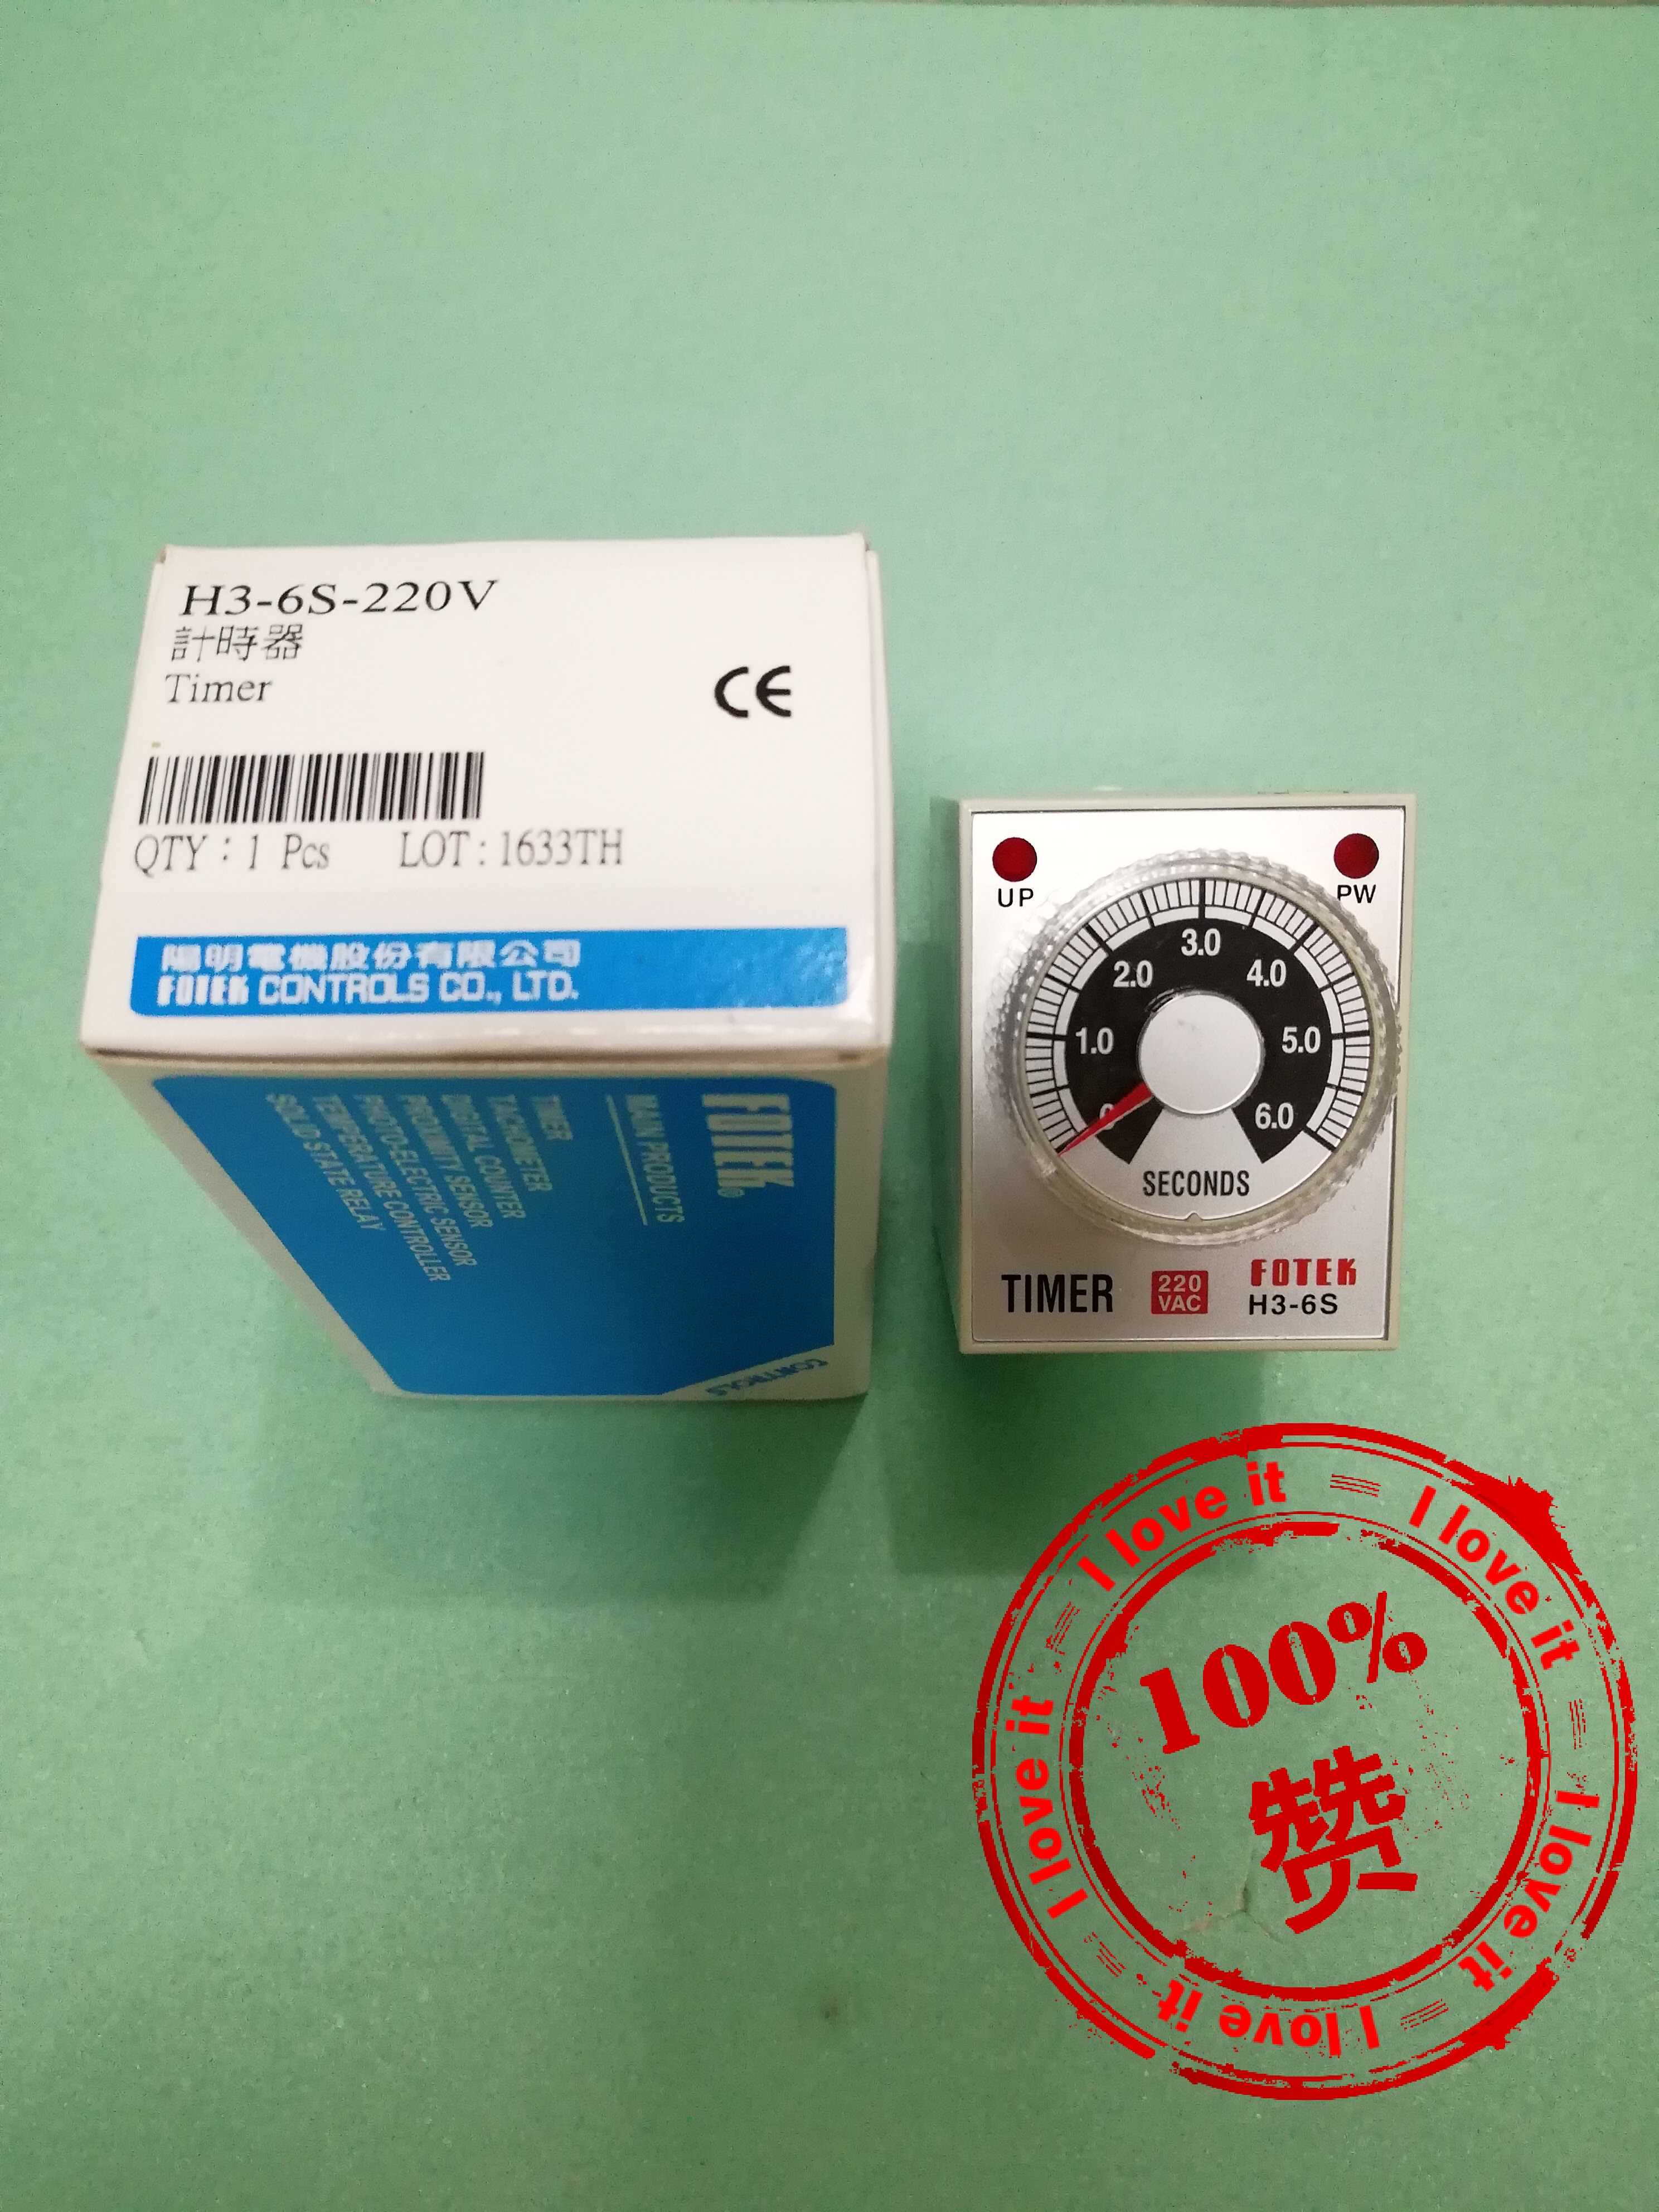 New Original Import Timer H3-6S-220V Time Relay 6 Seconds